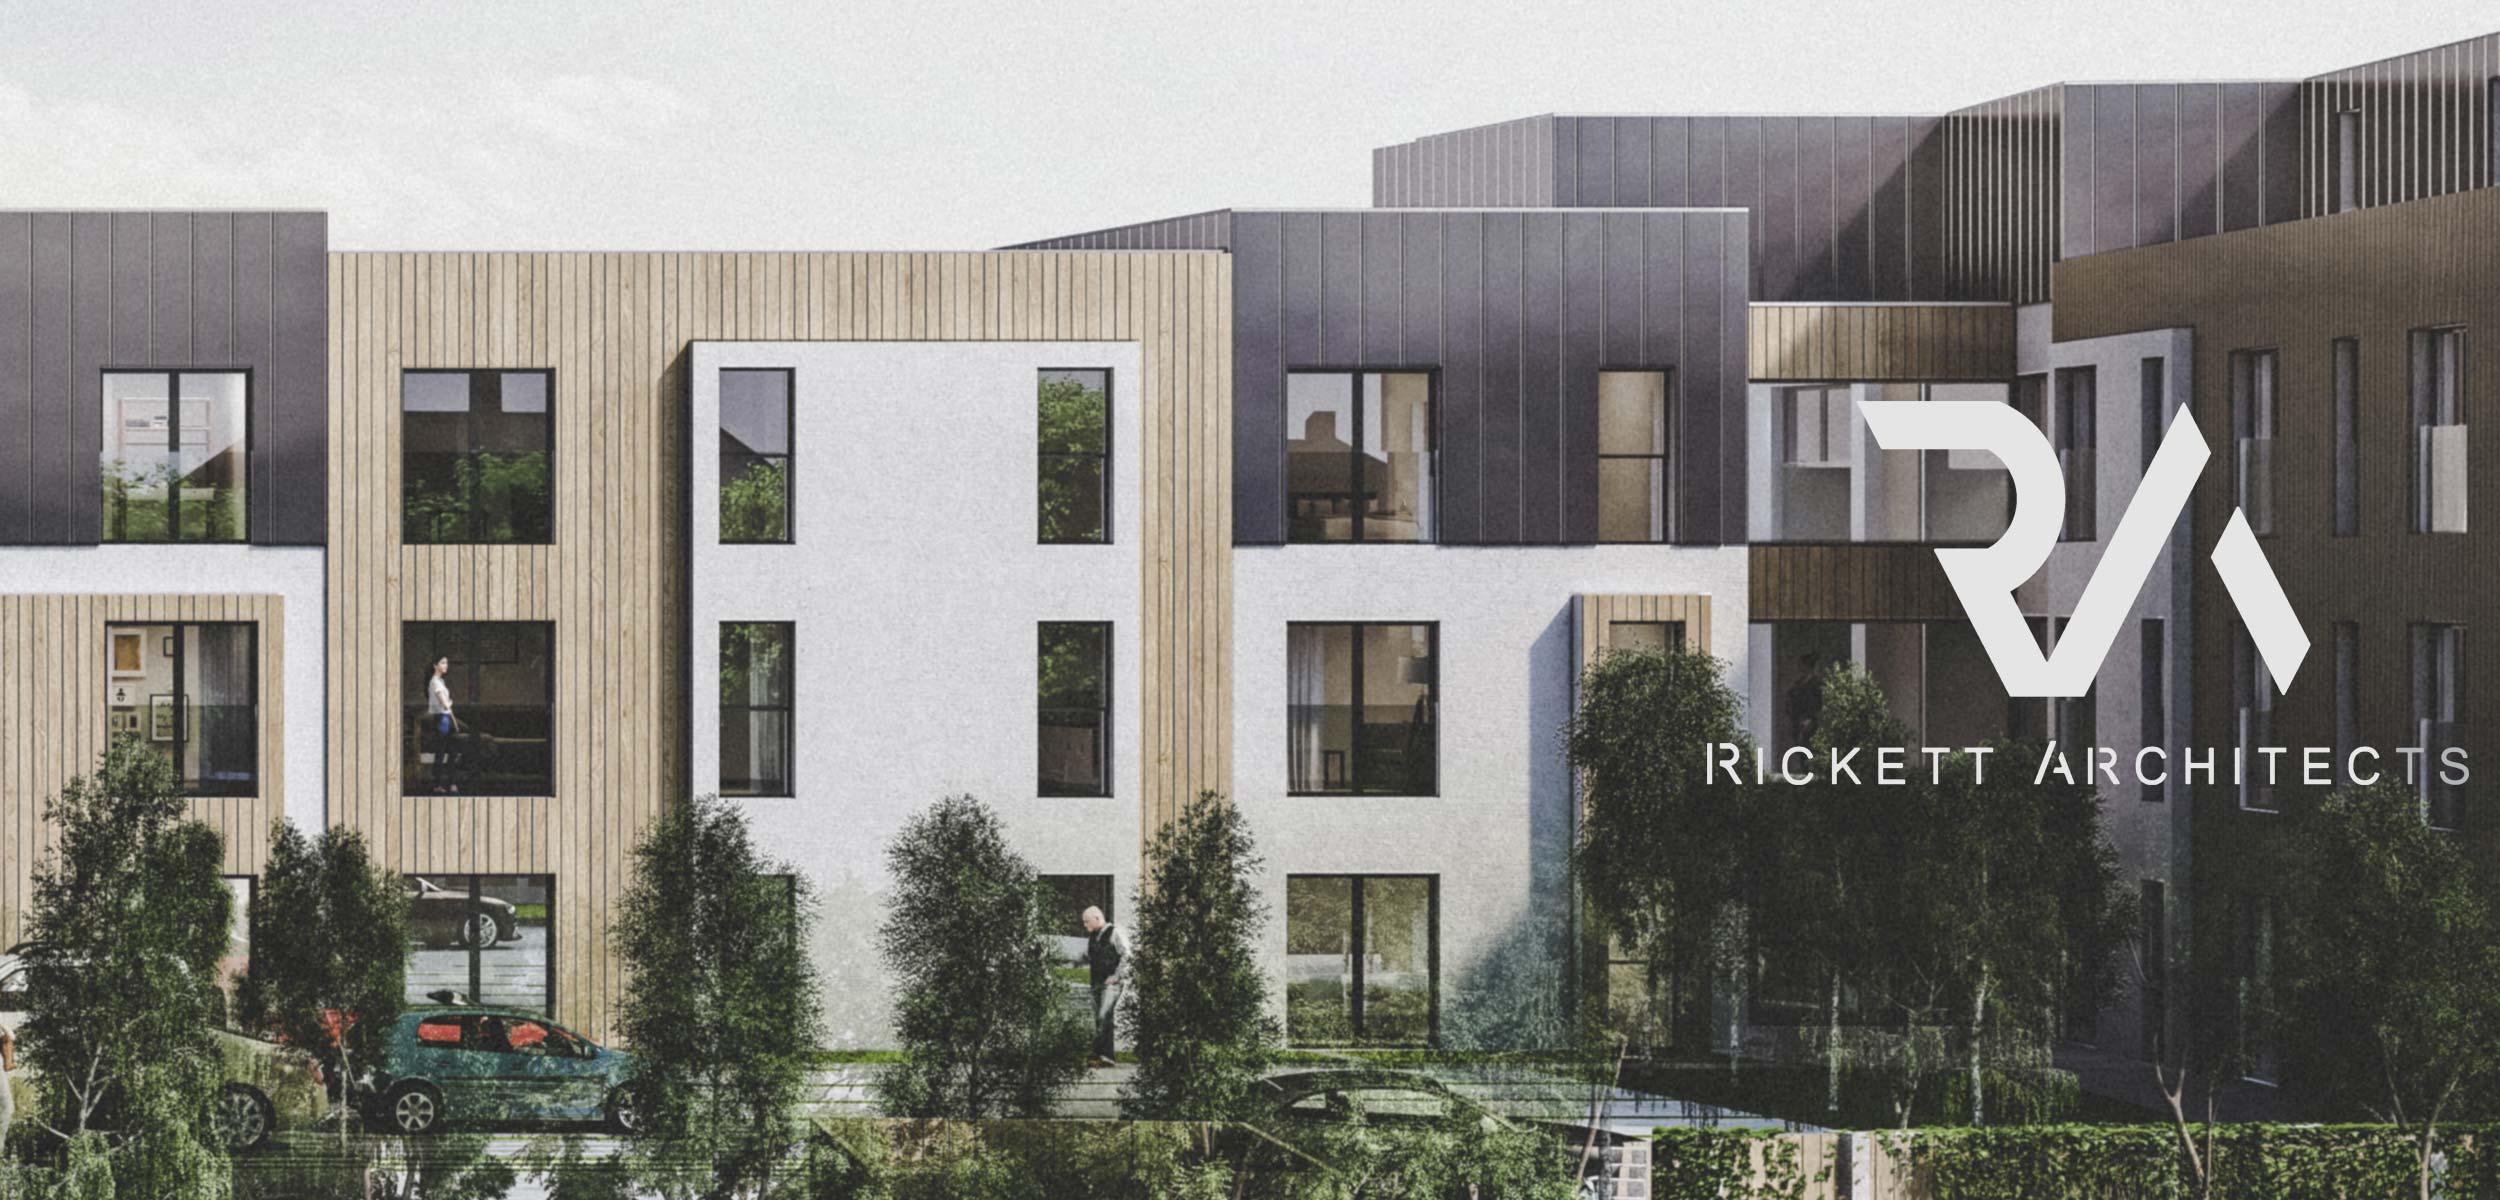 architectural_practice_in_birmingham_01.jpg